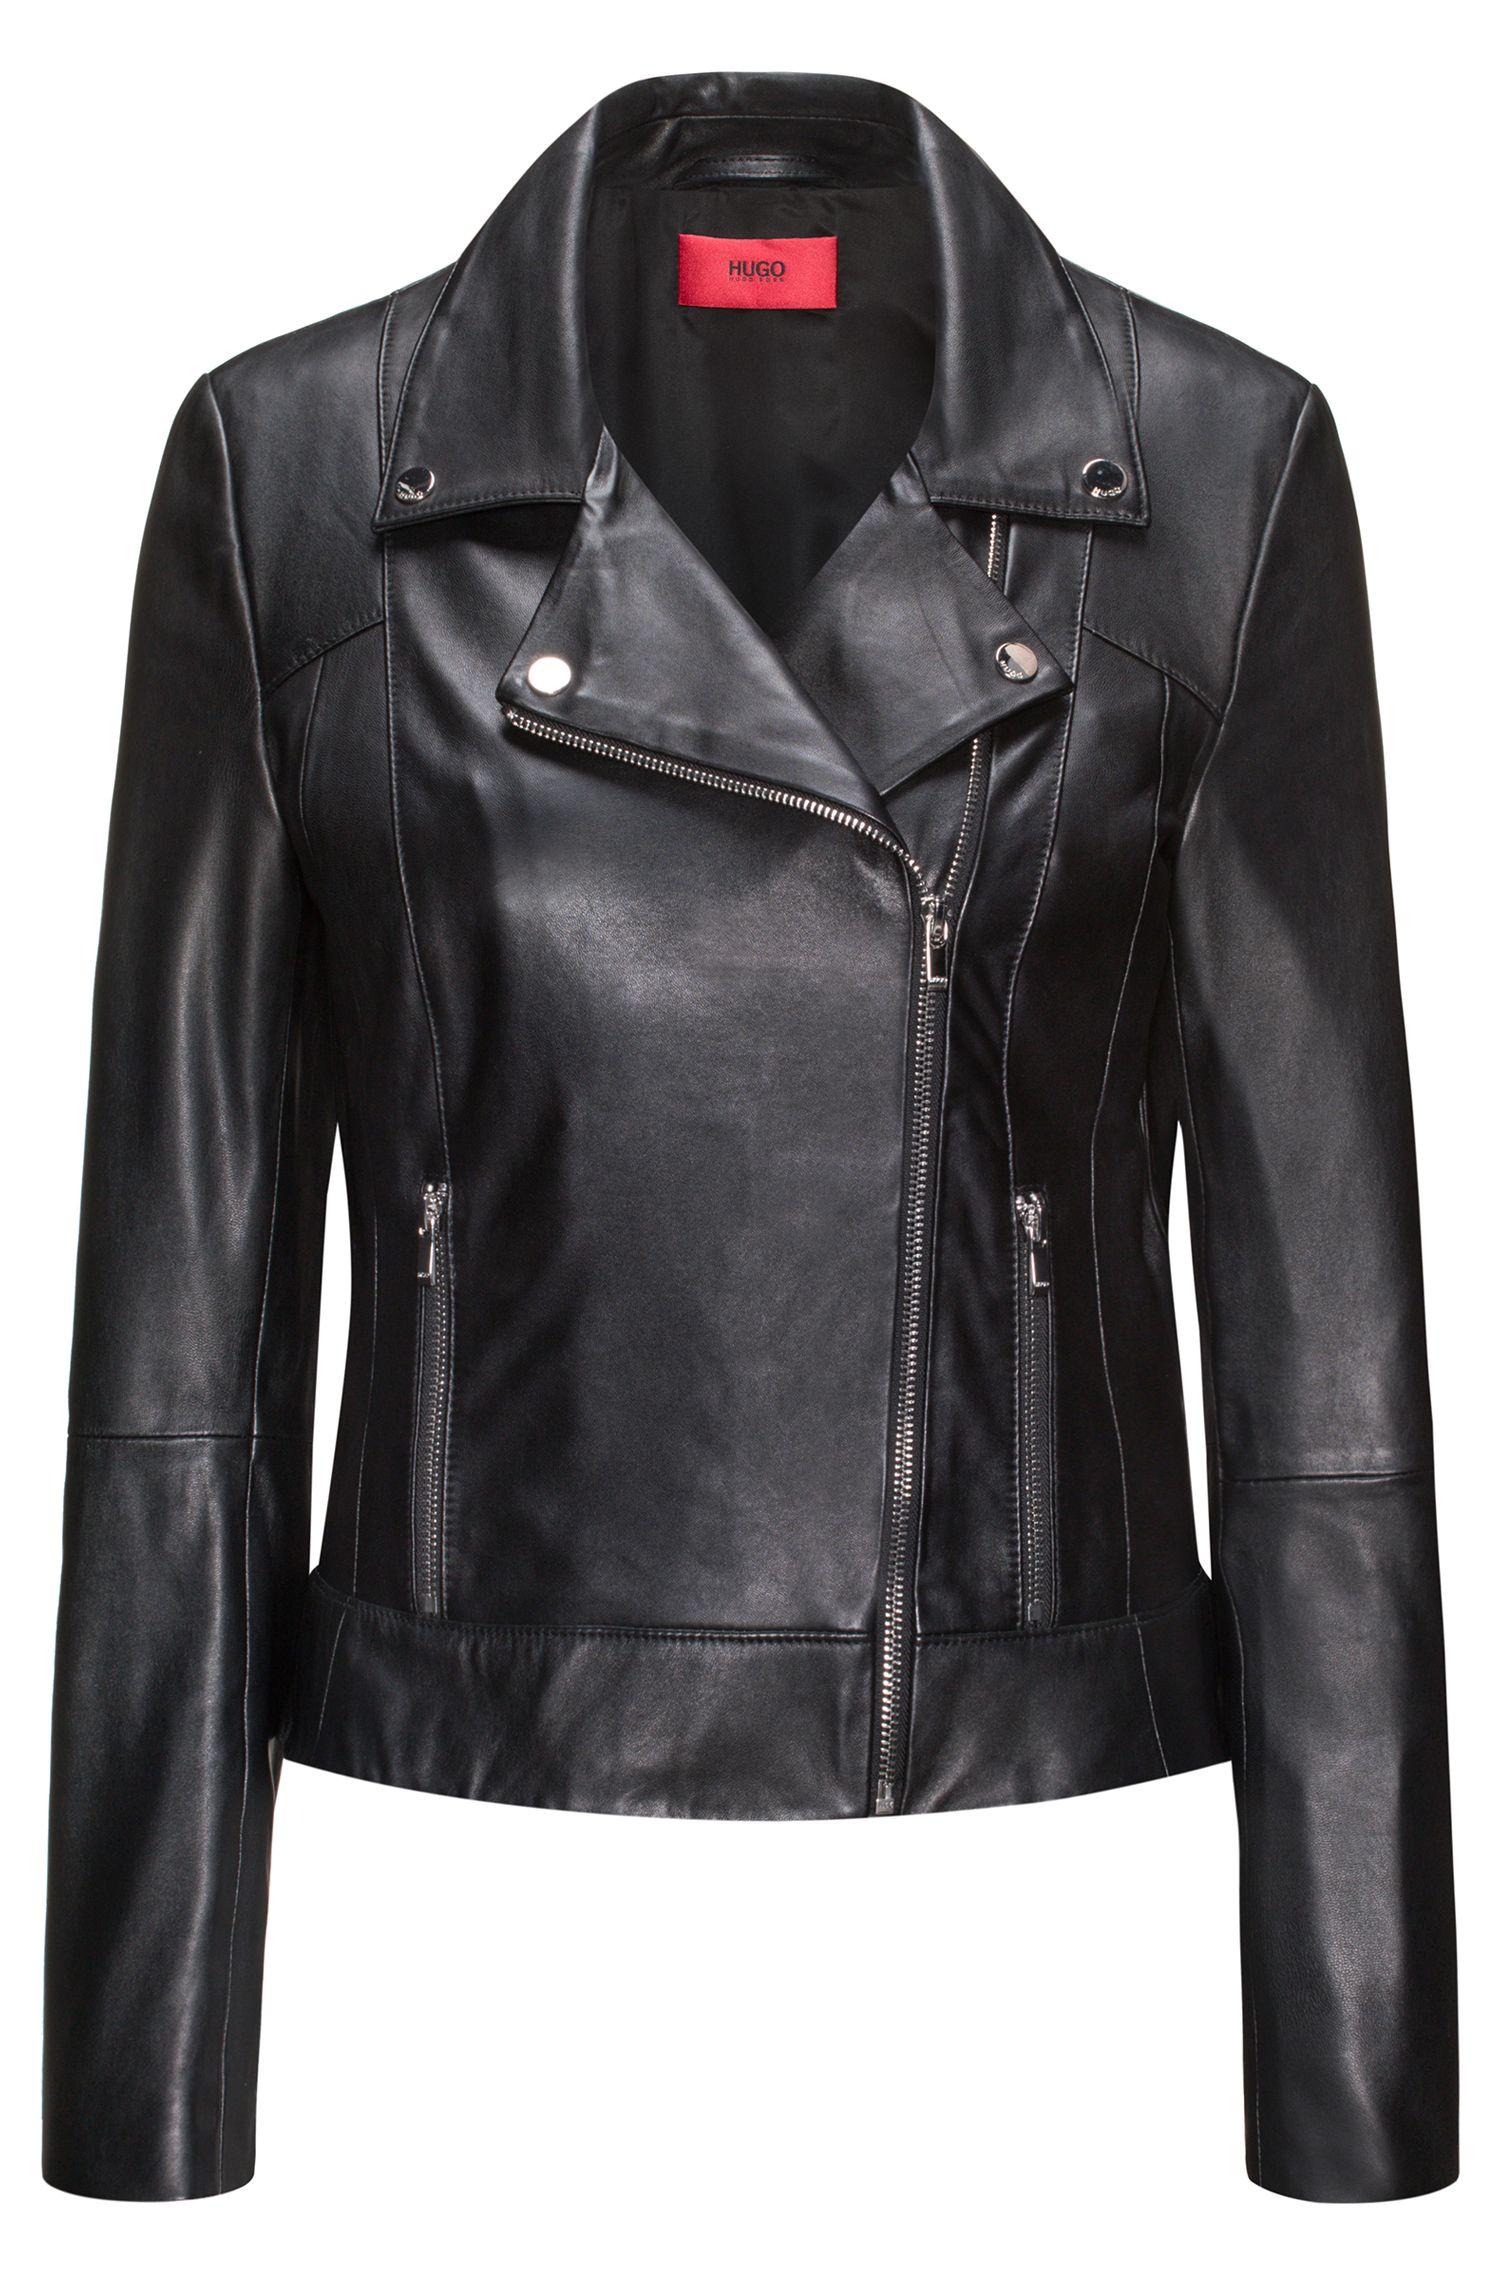 Leather biker jacket with smocked side panels